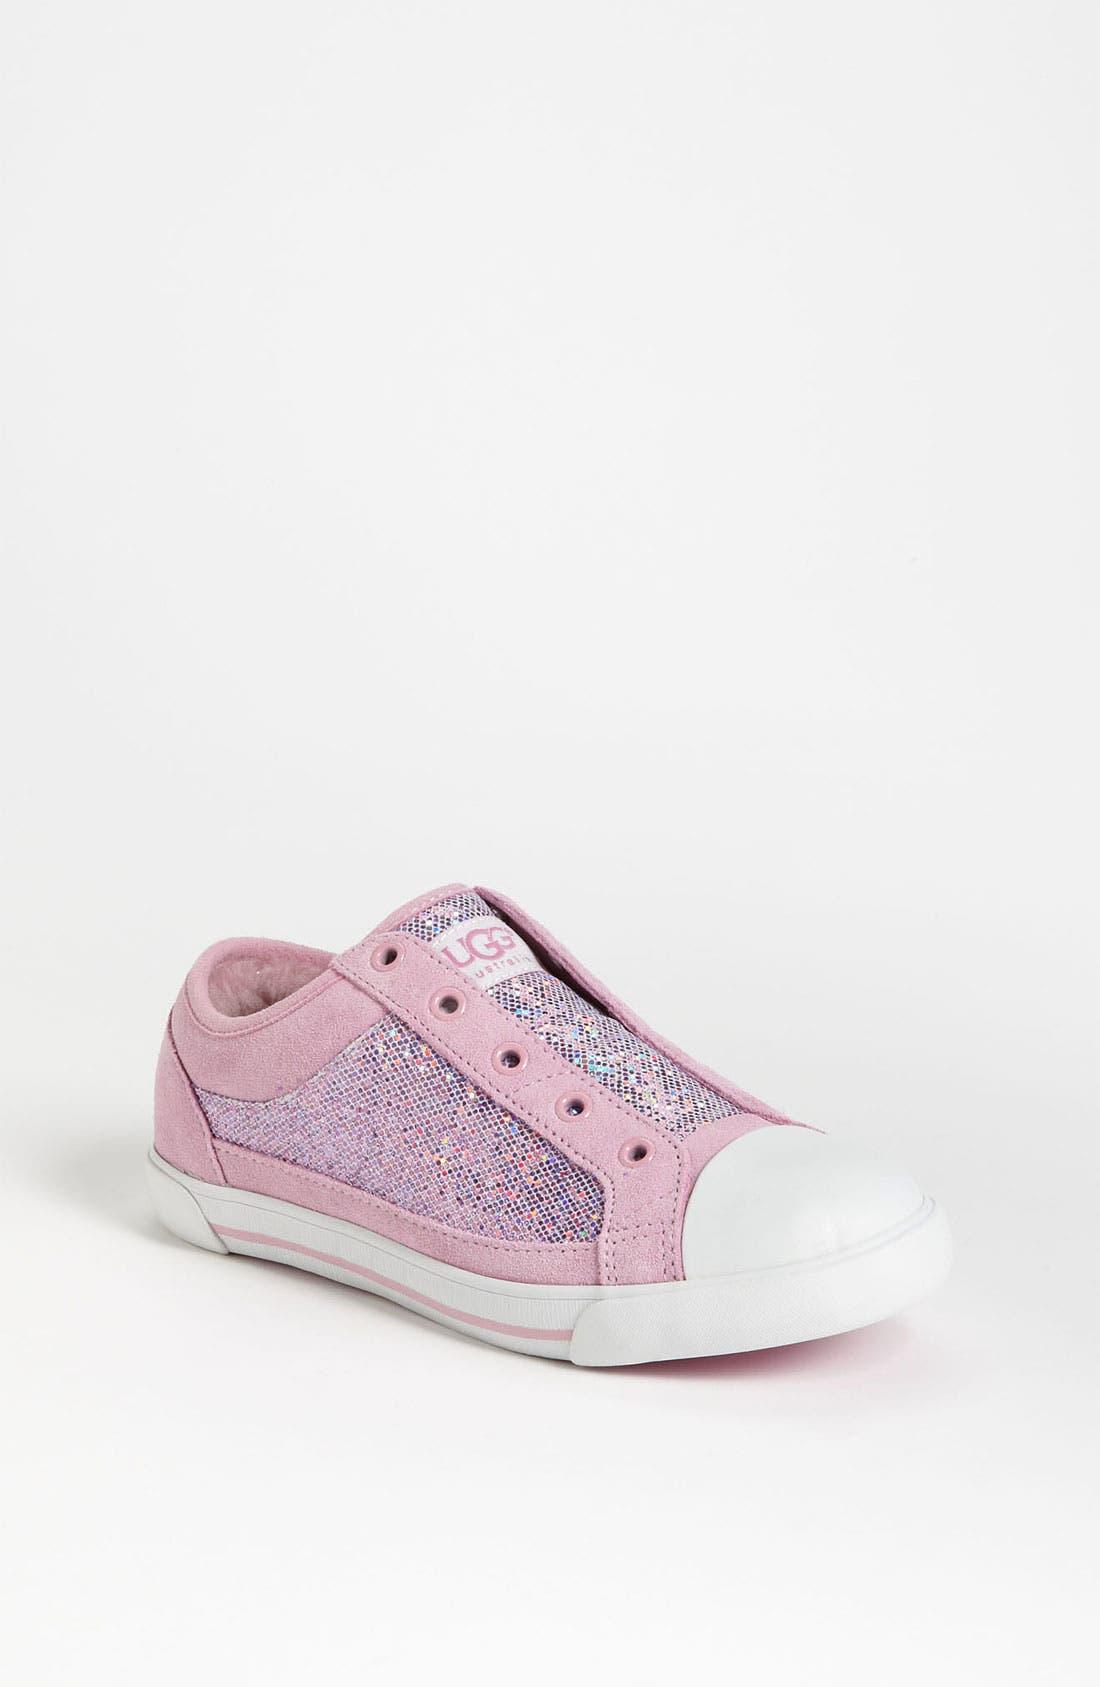 Alternate Image 1 Selected - UGG® Australia 'Laela' Sneaker (Toddler, Little Kid & Big Kid)